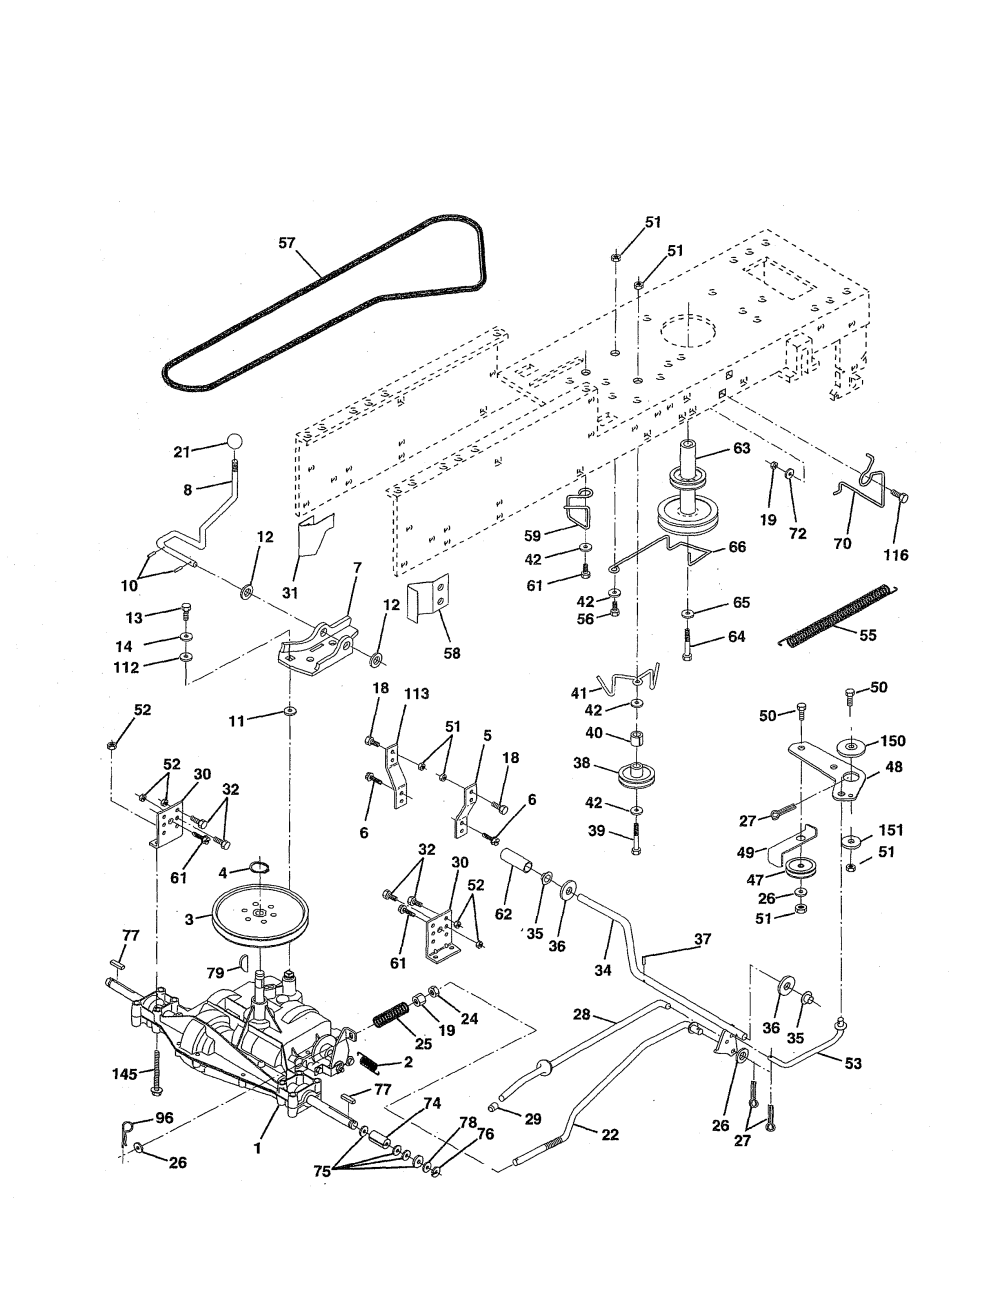 medium resolution of weed eater one wiring diagram schematic diagram 261 weed eater lawn mower wiring diagram